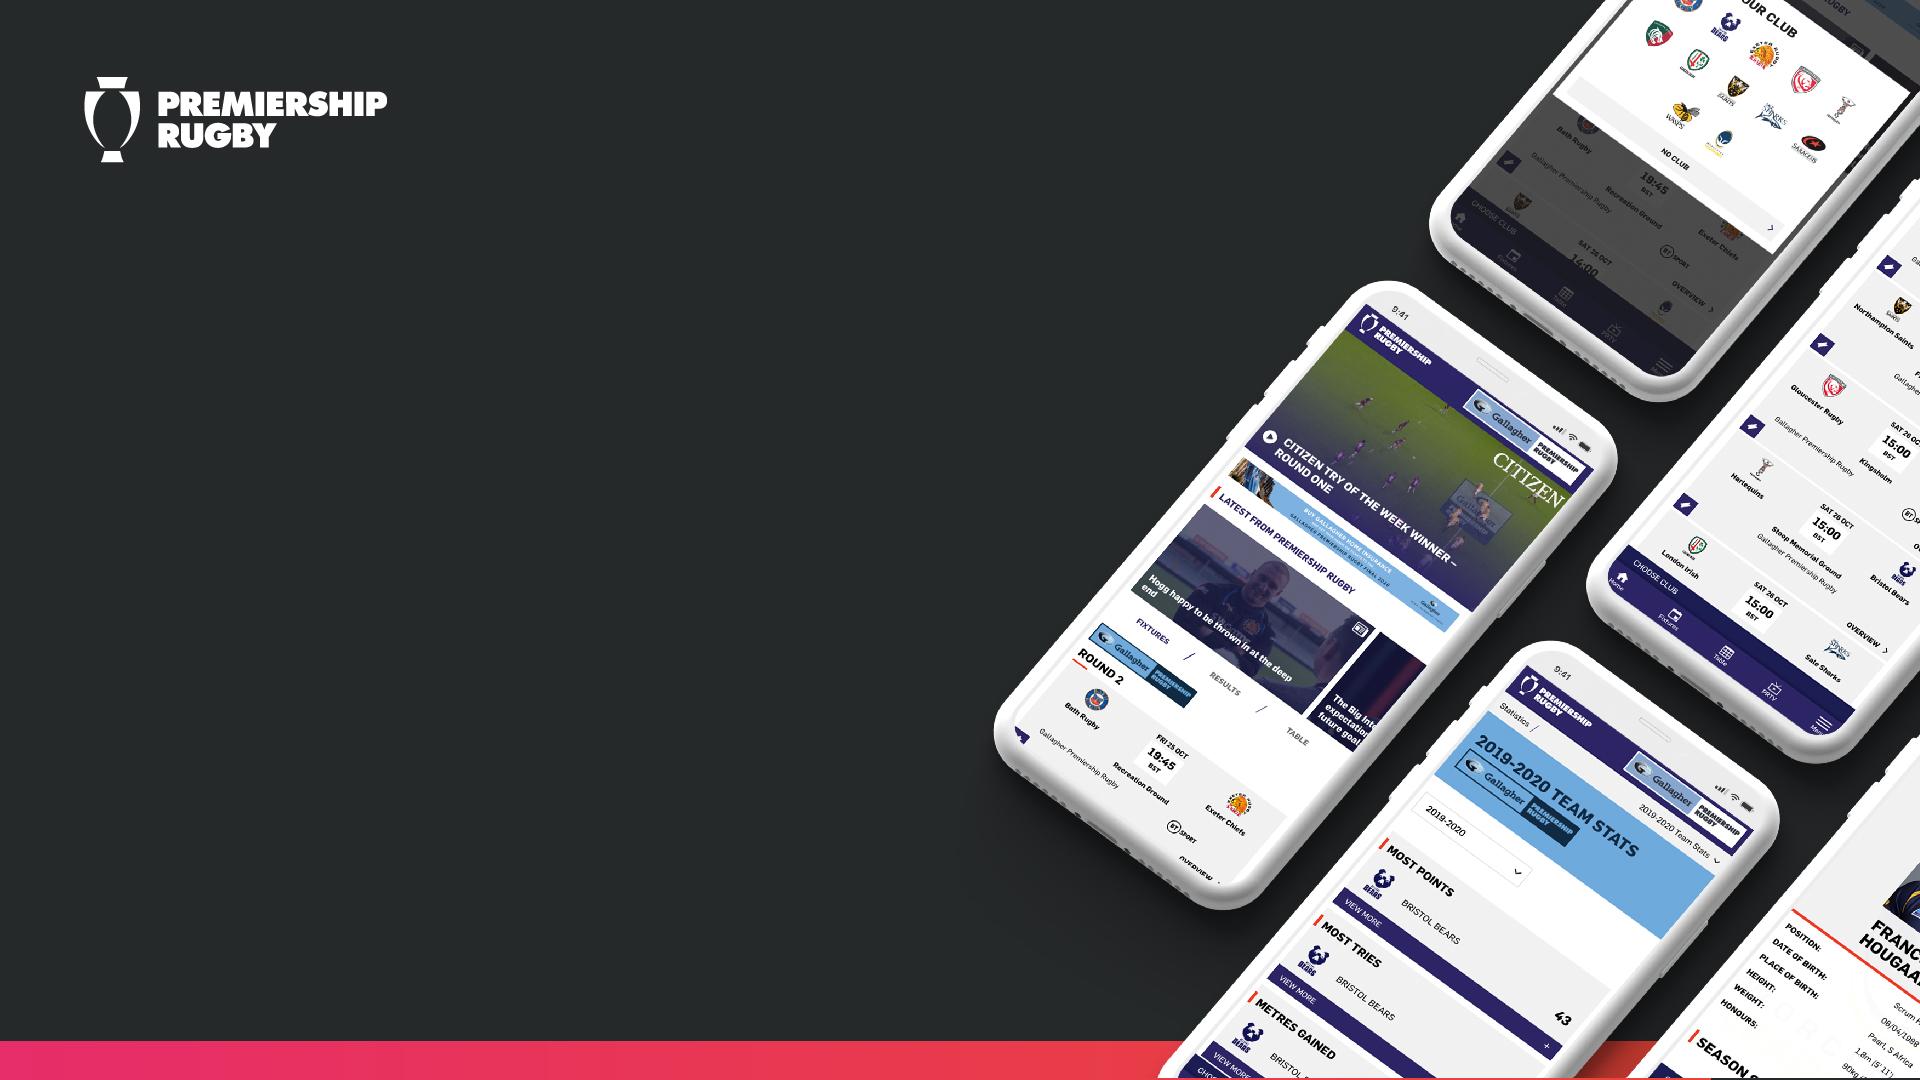 Fan-first digital platform